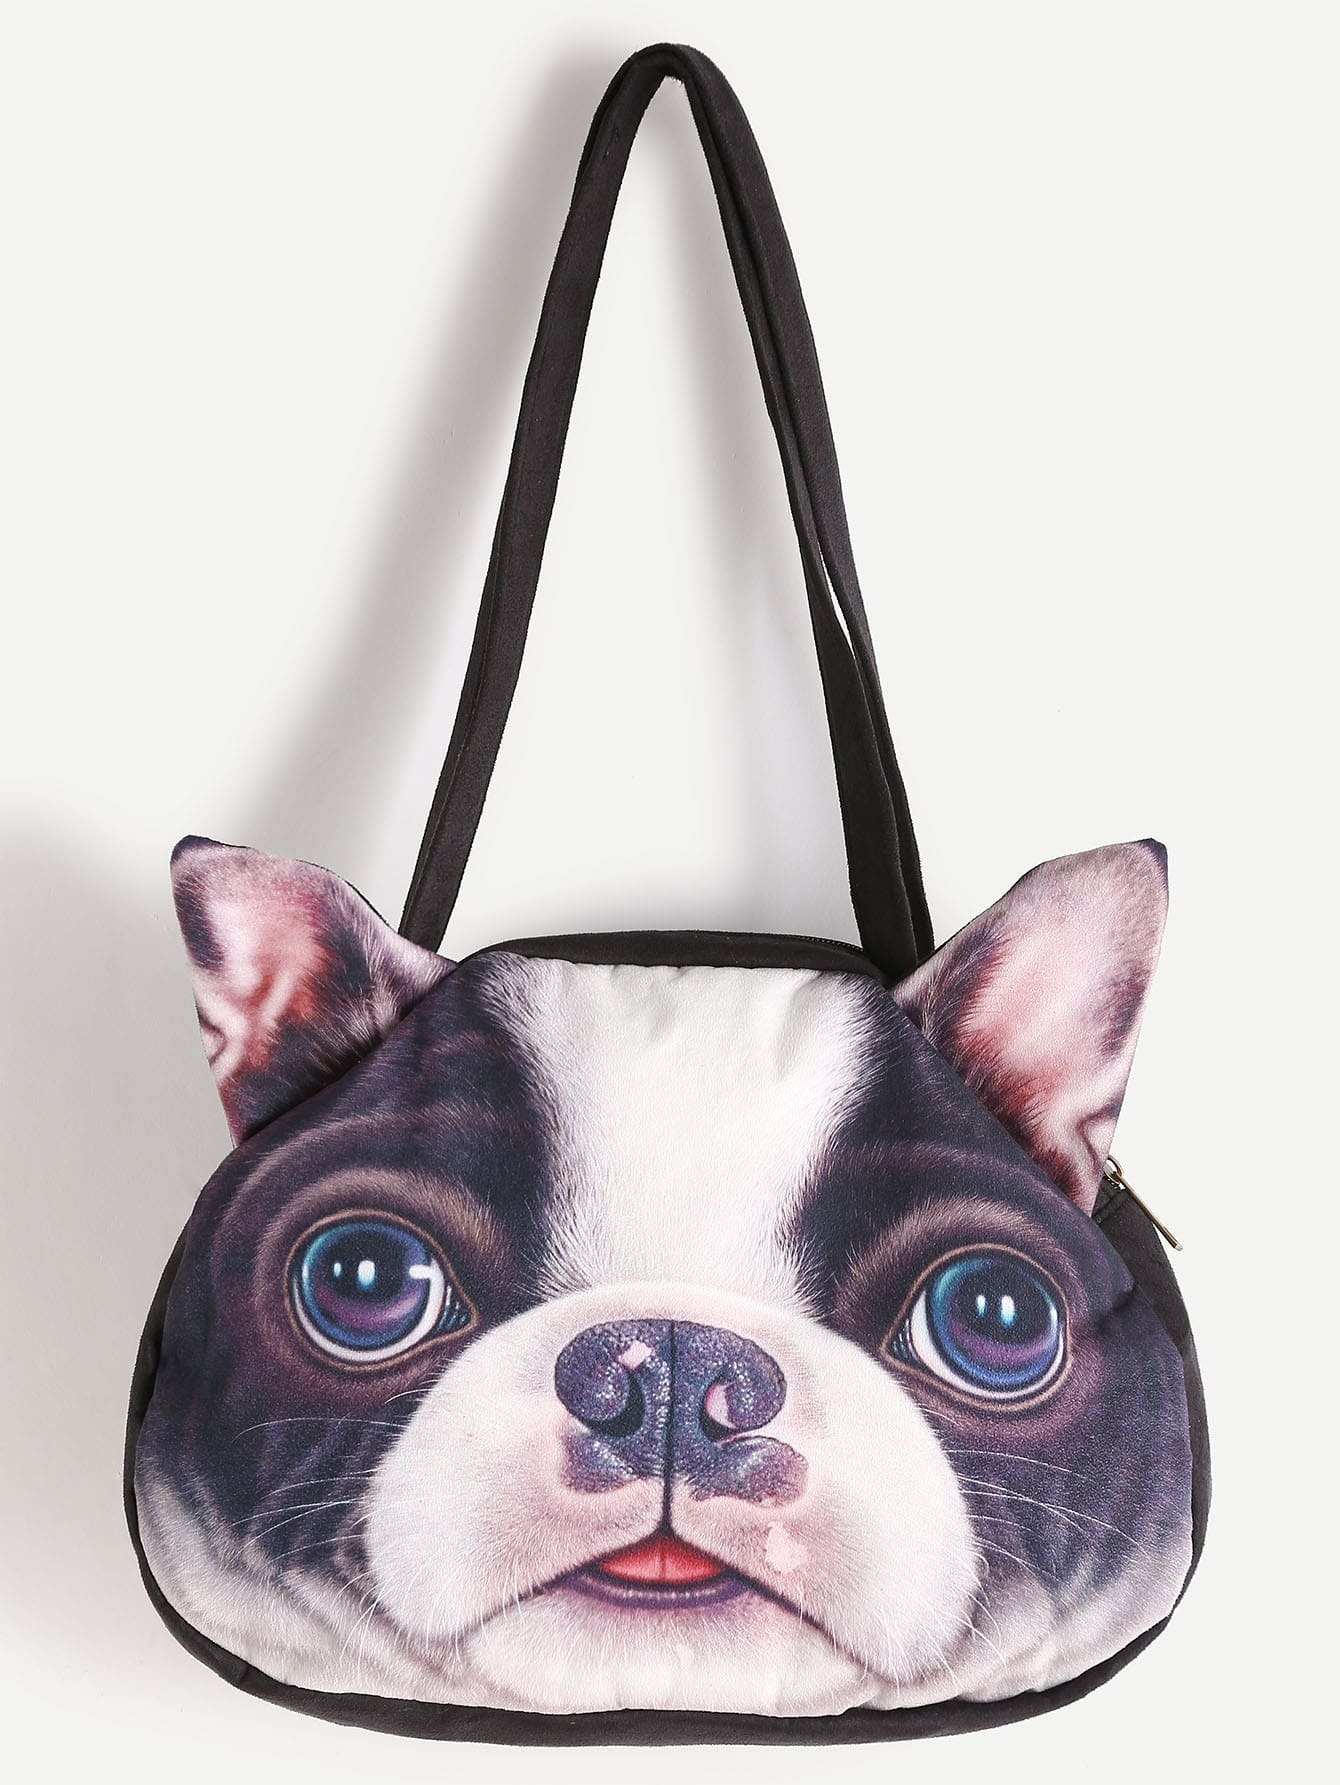 Dog Shaped Crossbody Bag